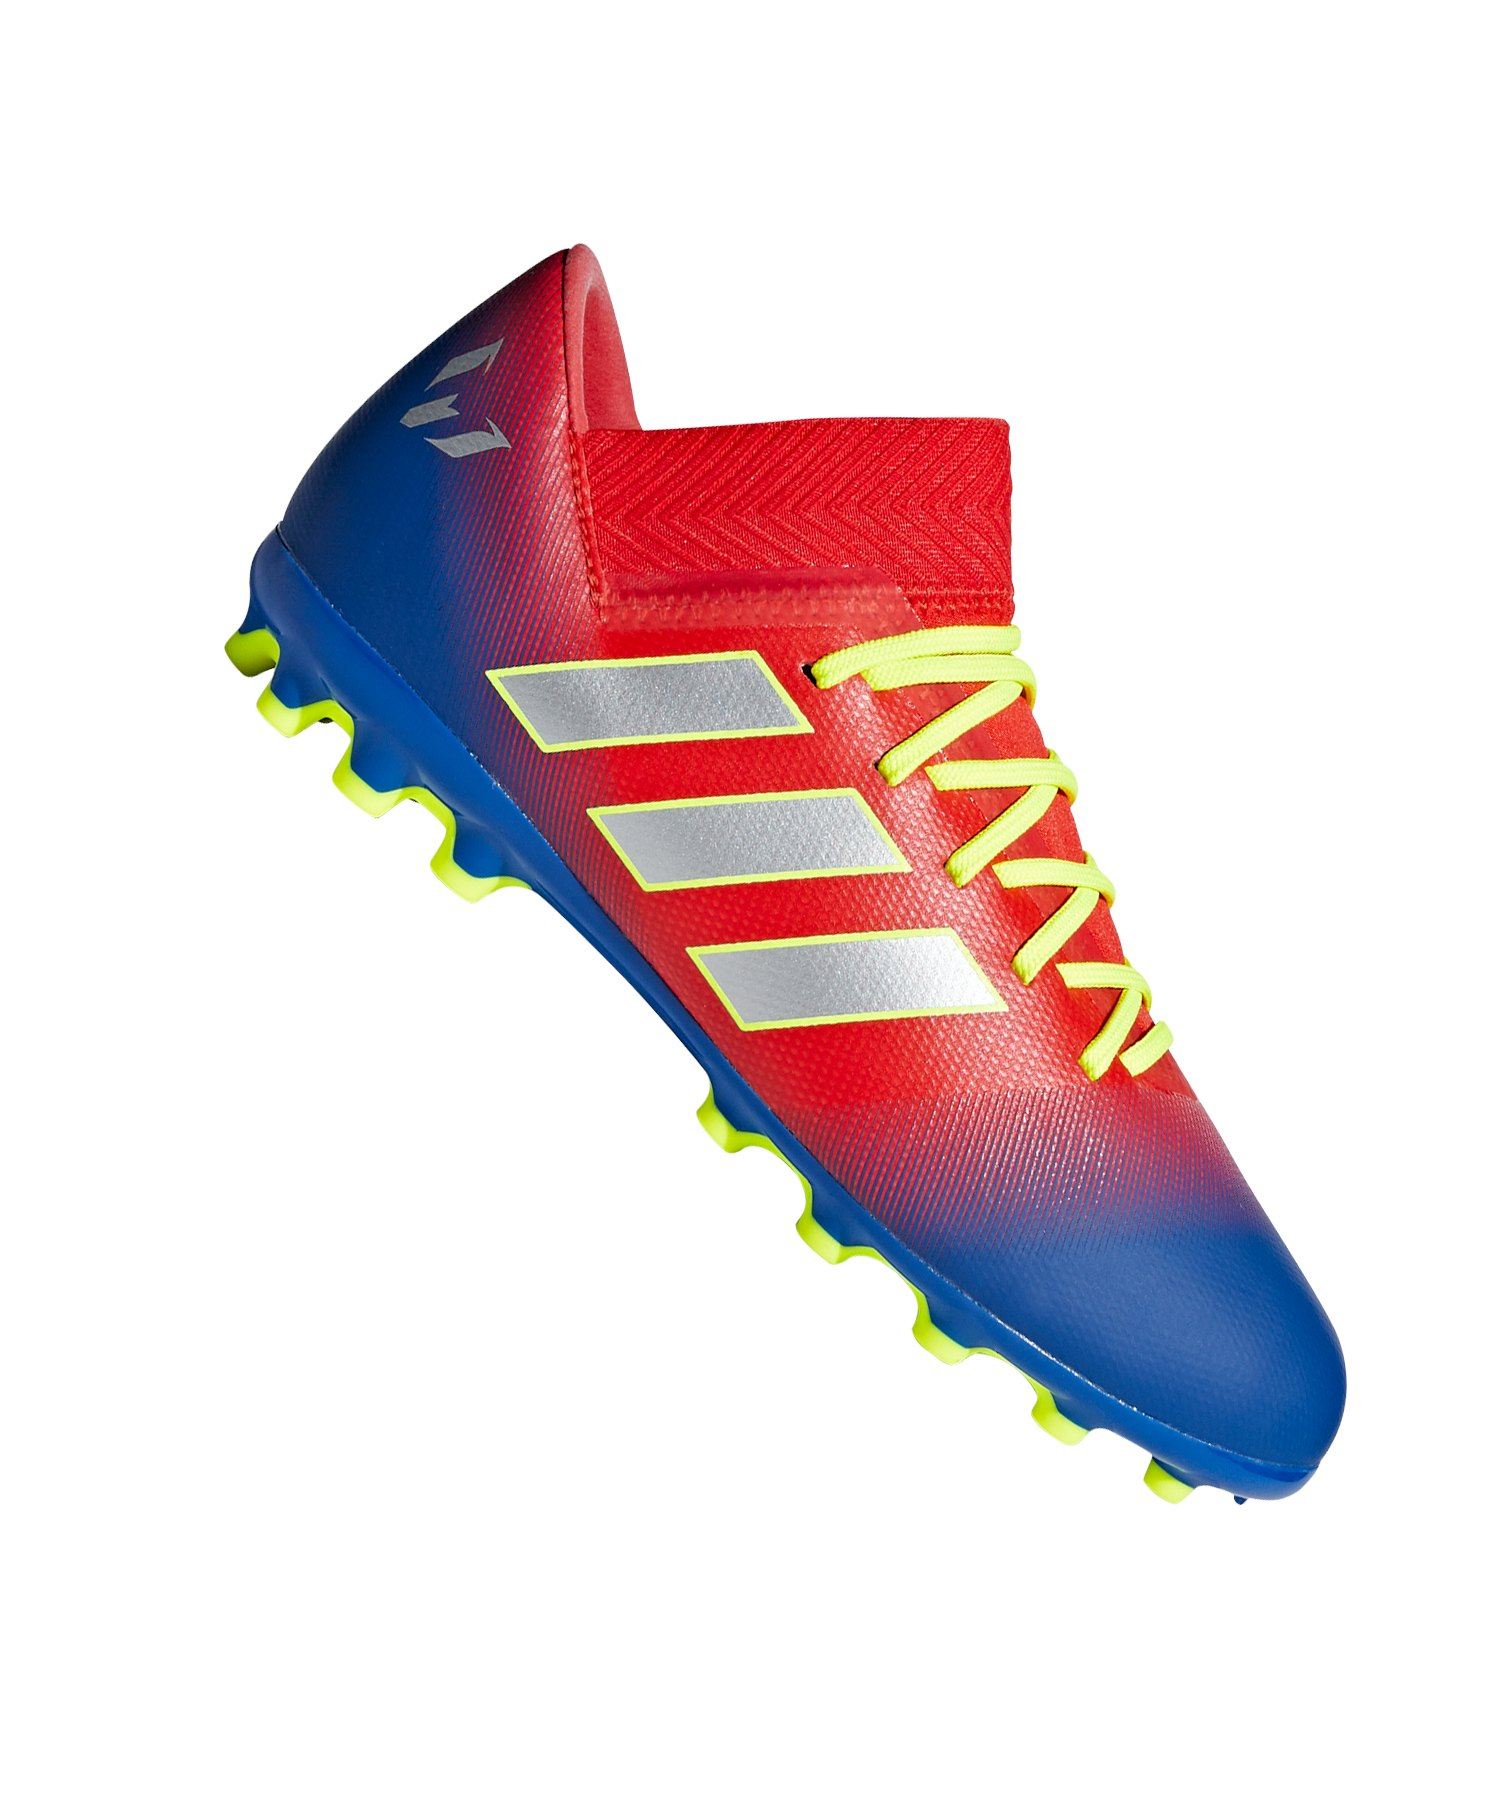 adidas NEMEZIZ Messi 18.3 AG J Kids Rot Blau - rot